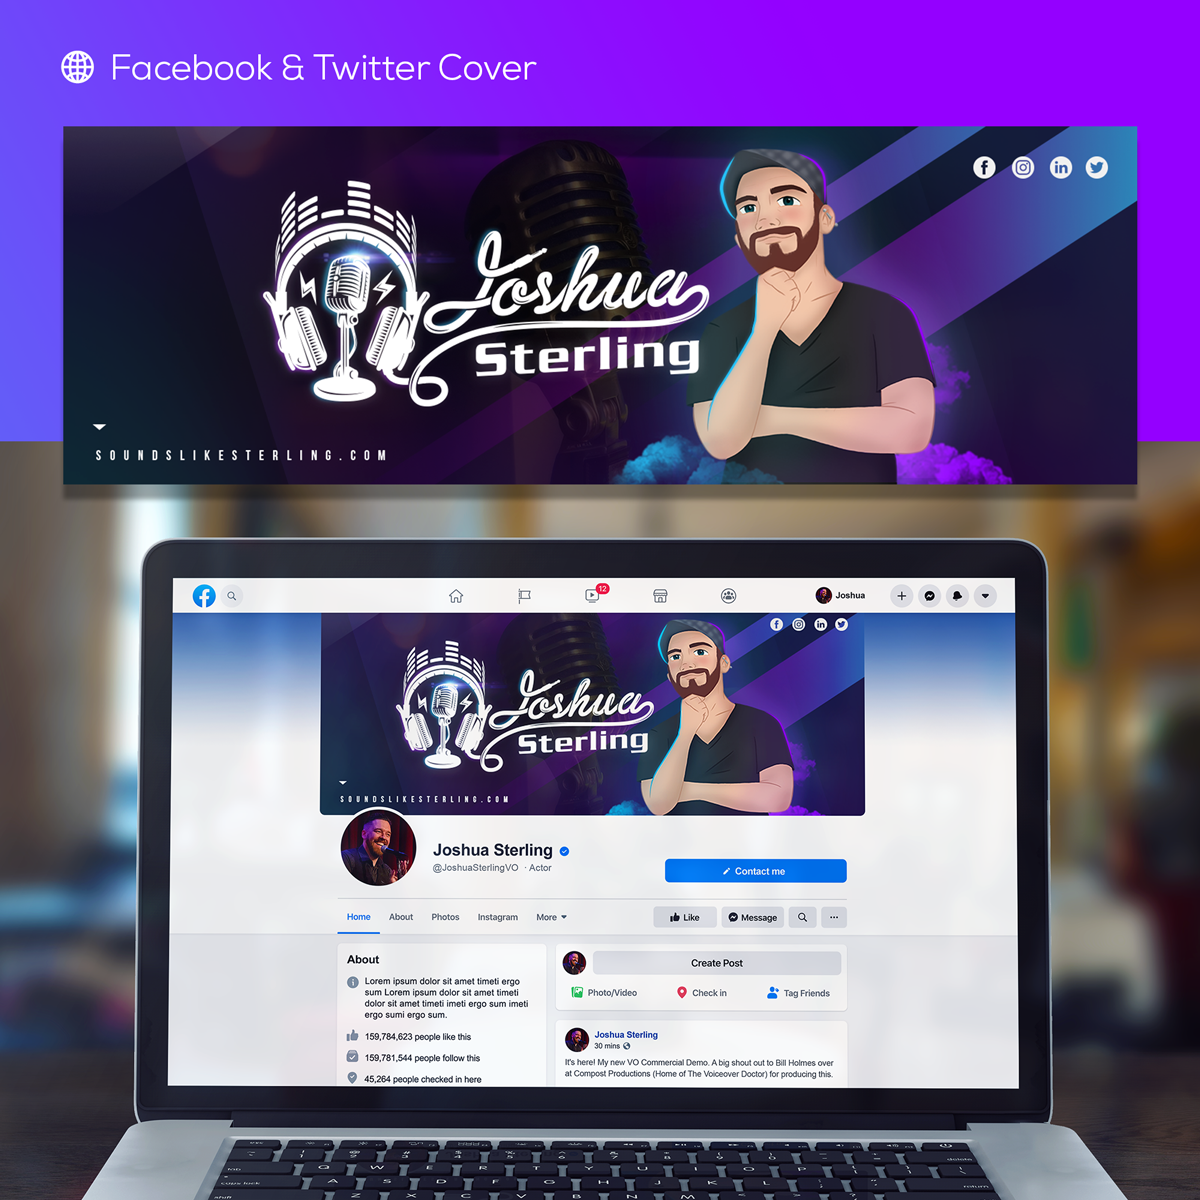 Joshua Sterling Facebook & Twitter Header Image